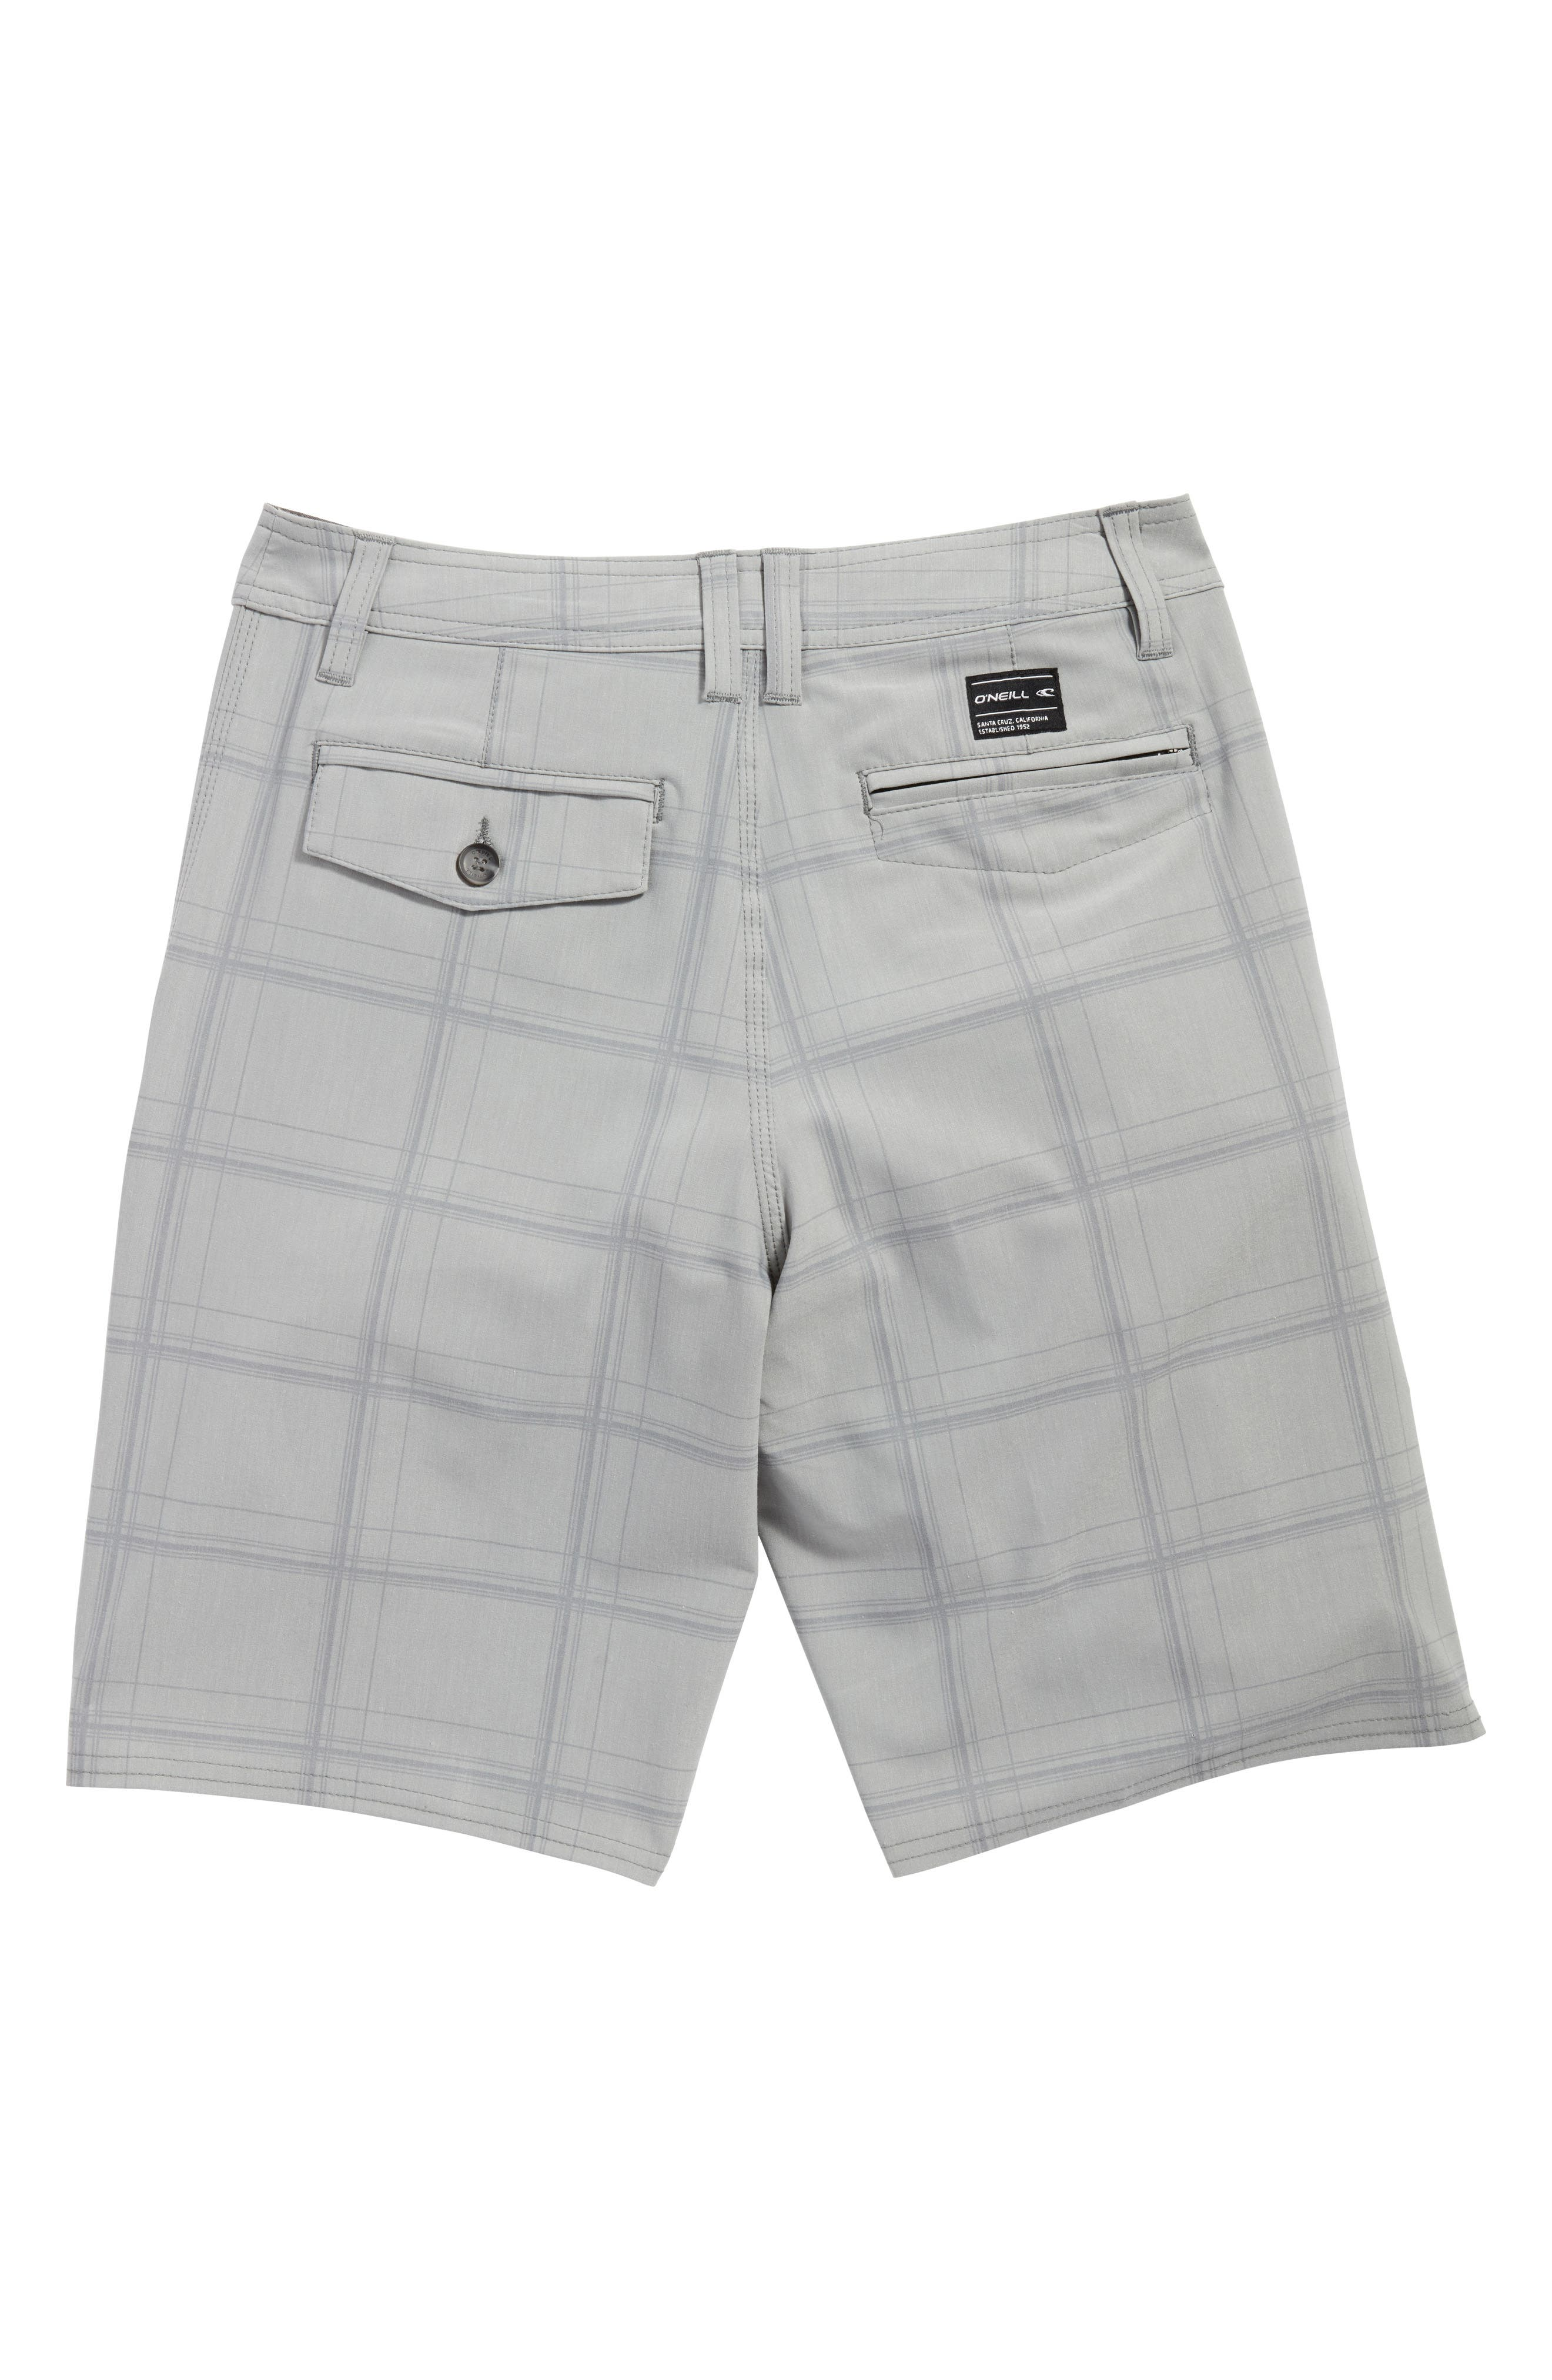 Alternate Image 2  - O'Neill Mixed Hybrid Shorts (Big Boys)